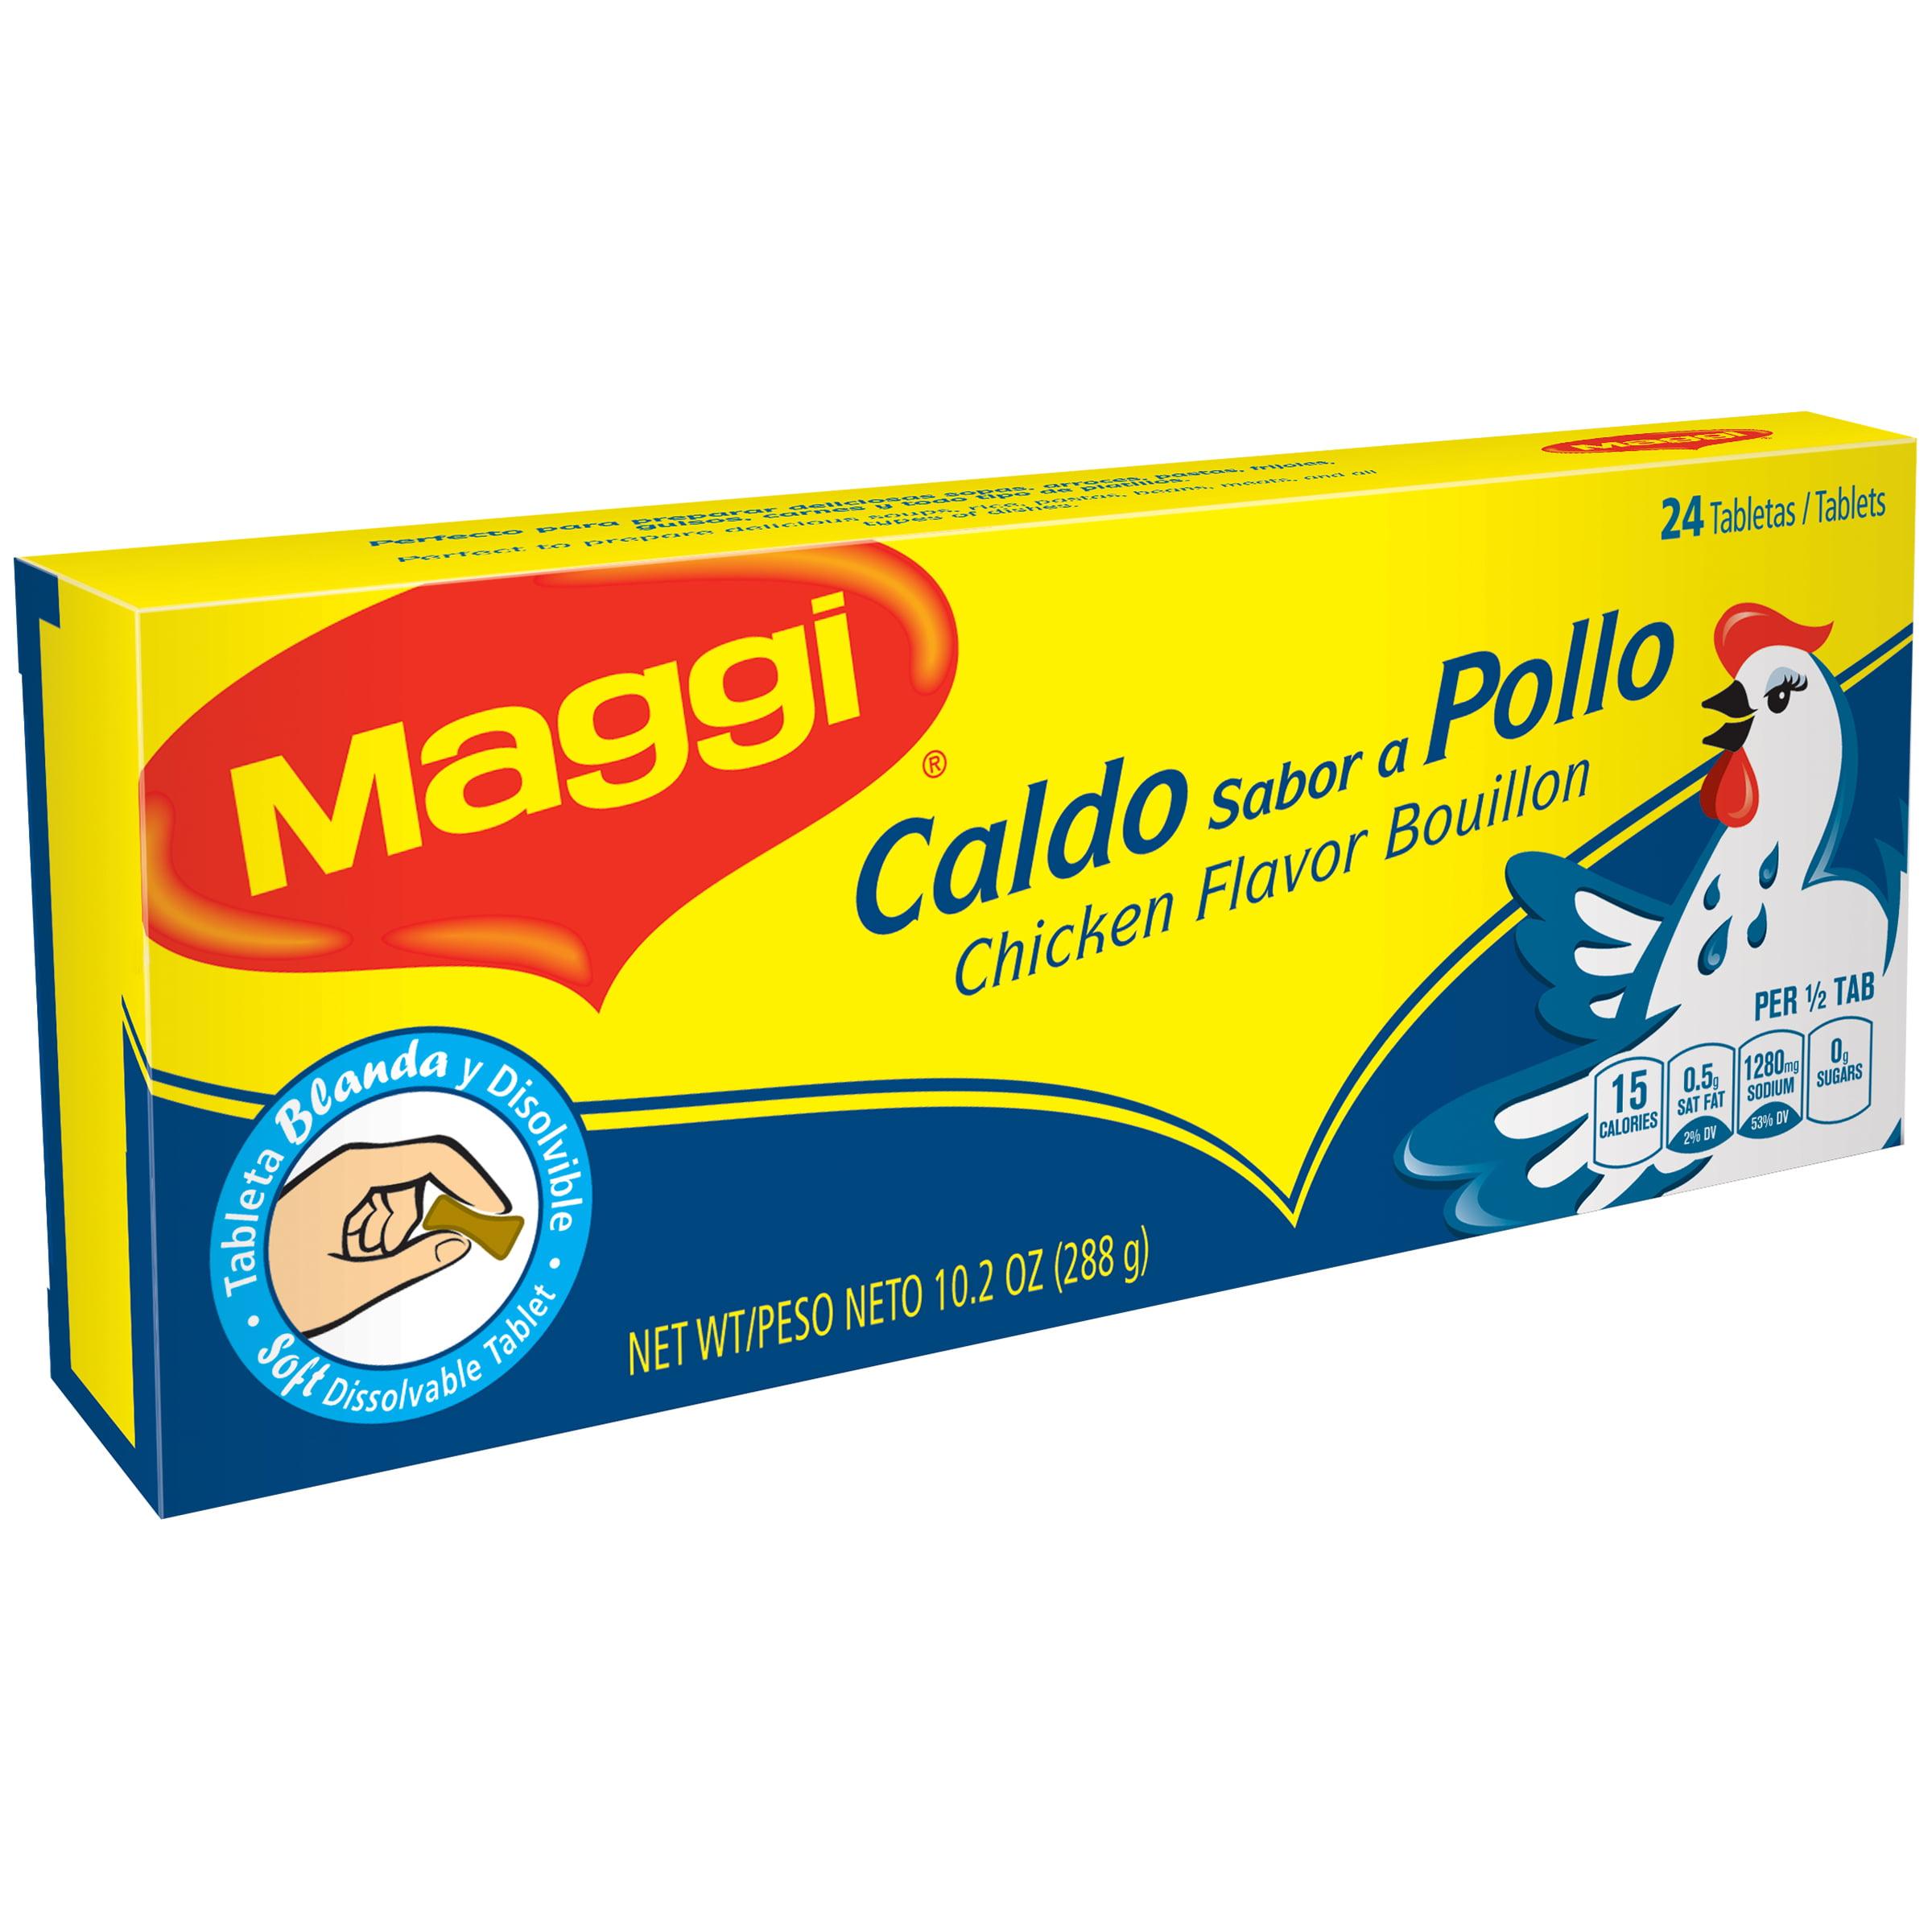 Maggi Liquid Seasoning, 27 fl oz - Walmart.com